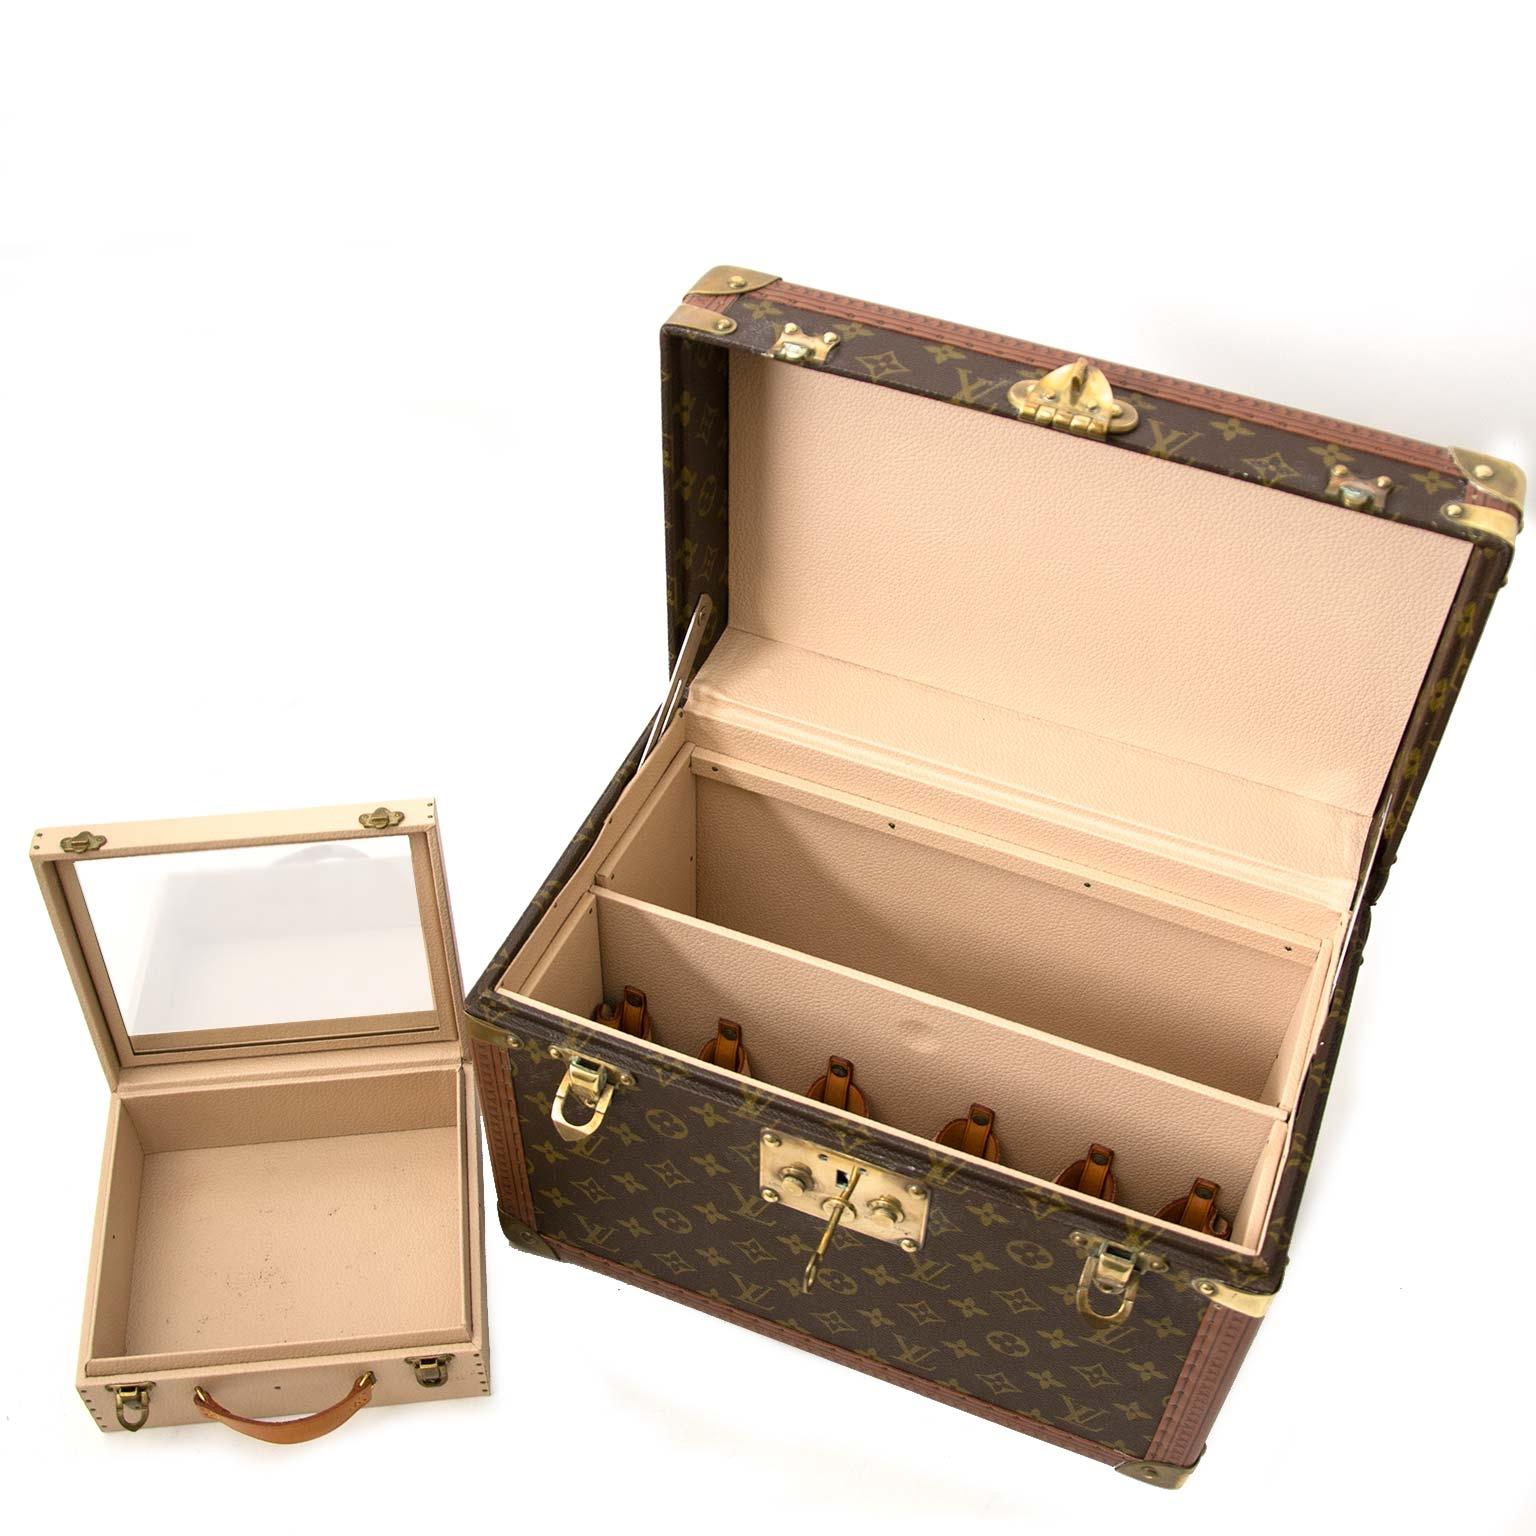 louis vuitton monogram reis trunk case te koop bij labellov vintage mode webshop belgië